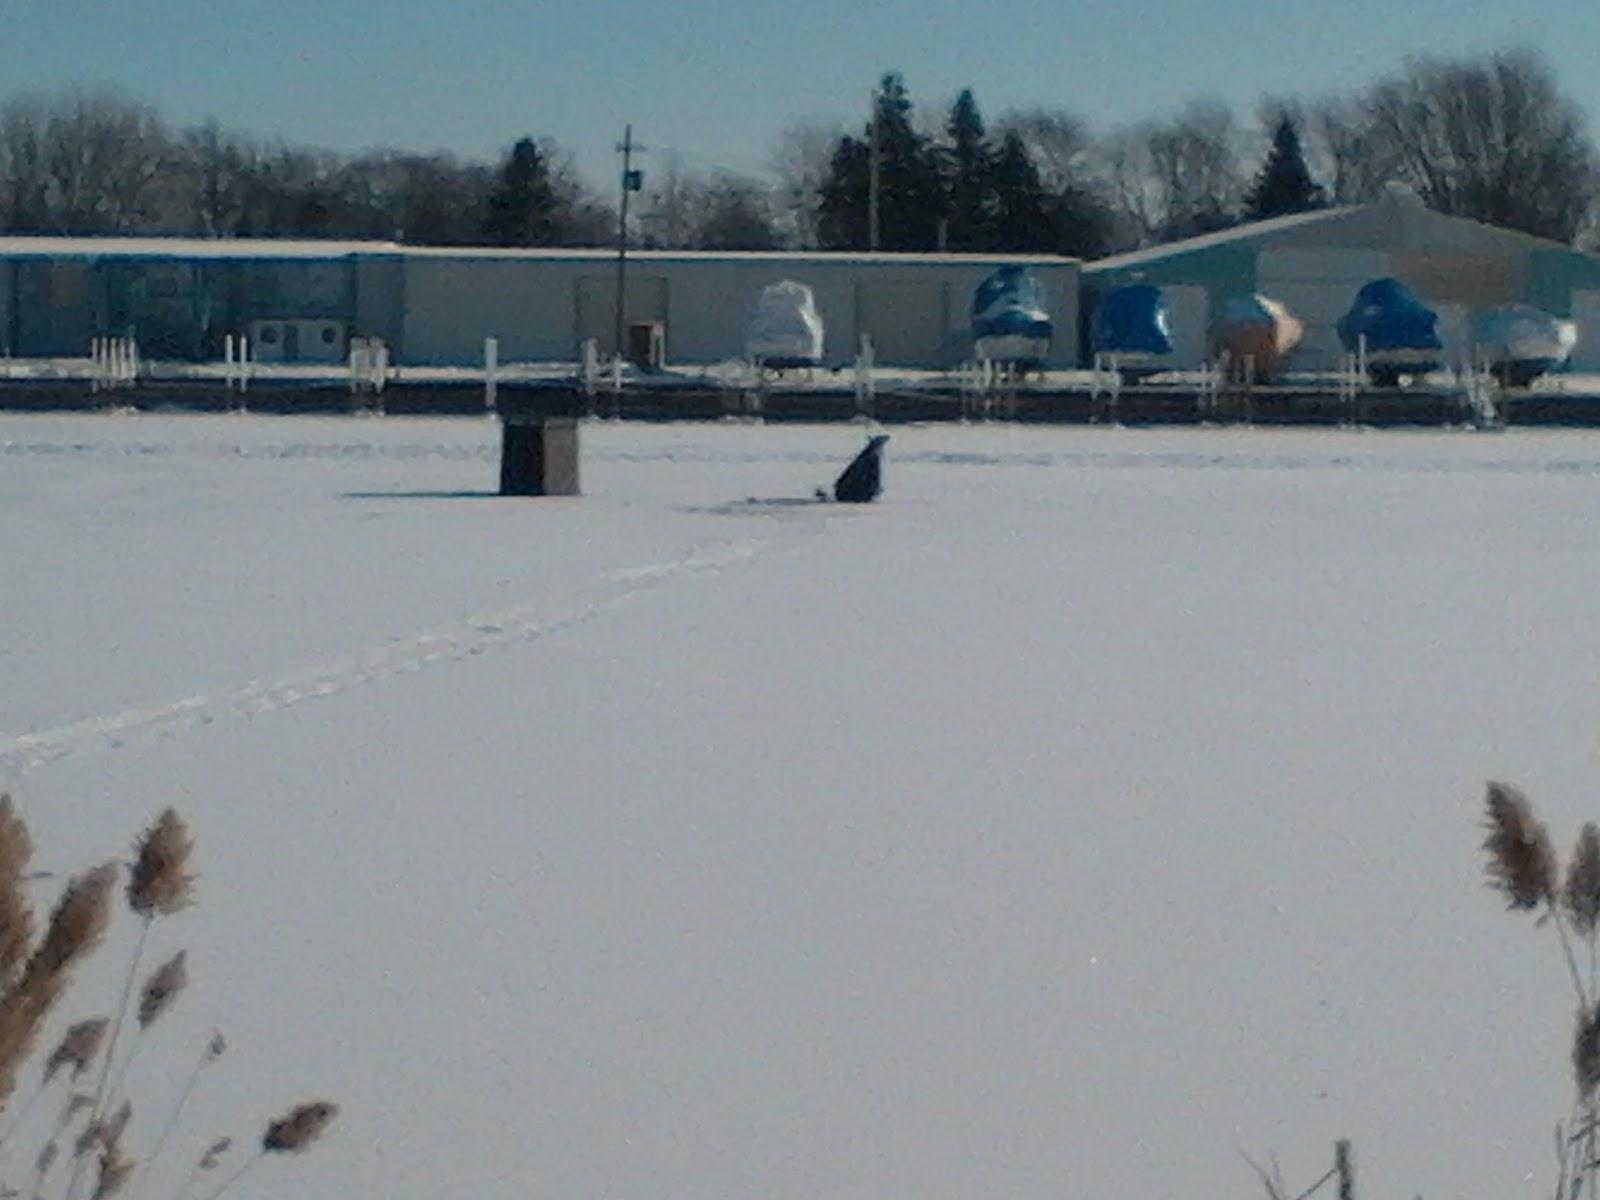 Houghton lake walleye report start of 2010 ice fishing season for Saginaw bay fishing